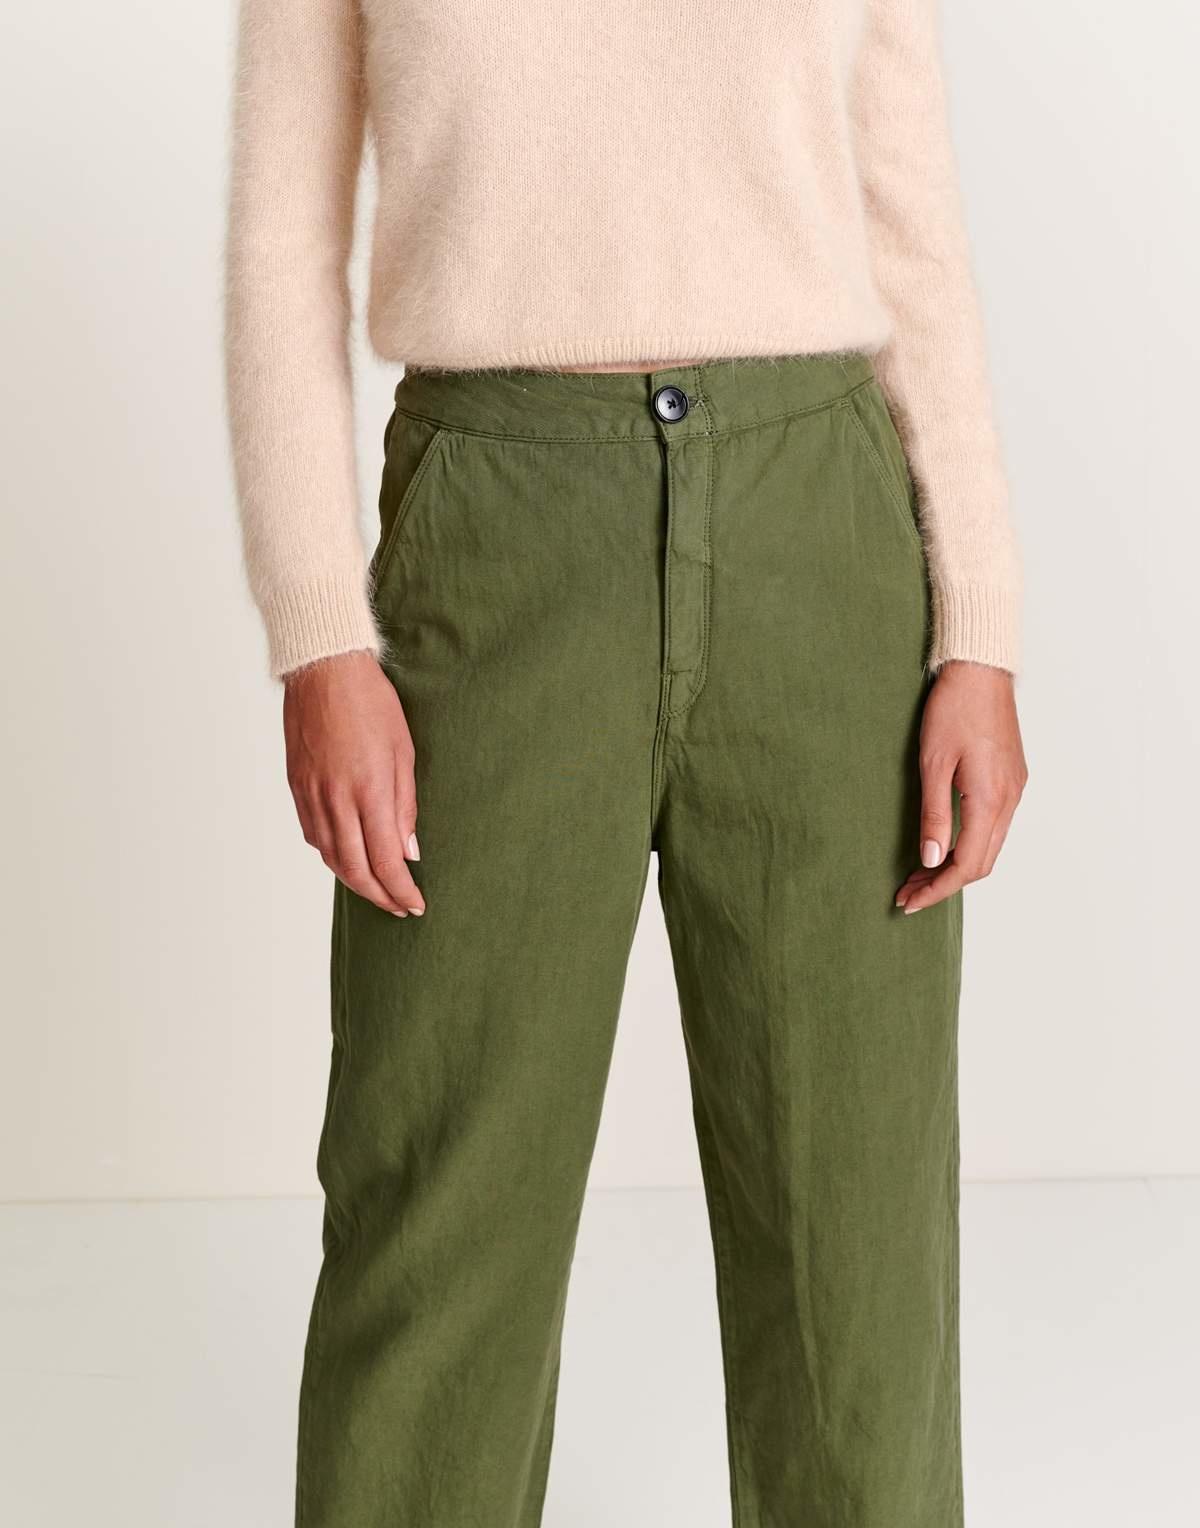 Bellerose Bellerose Pasop Cropped Pants